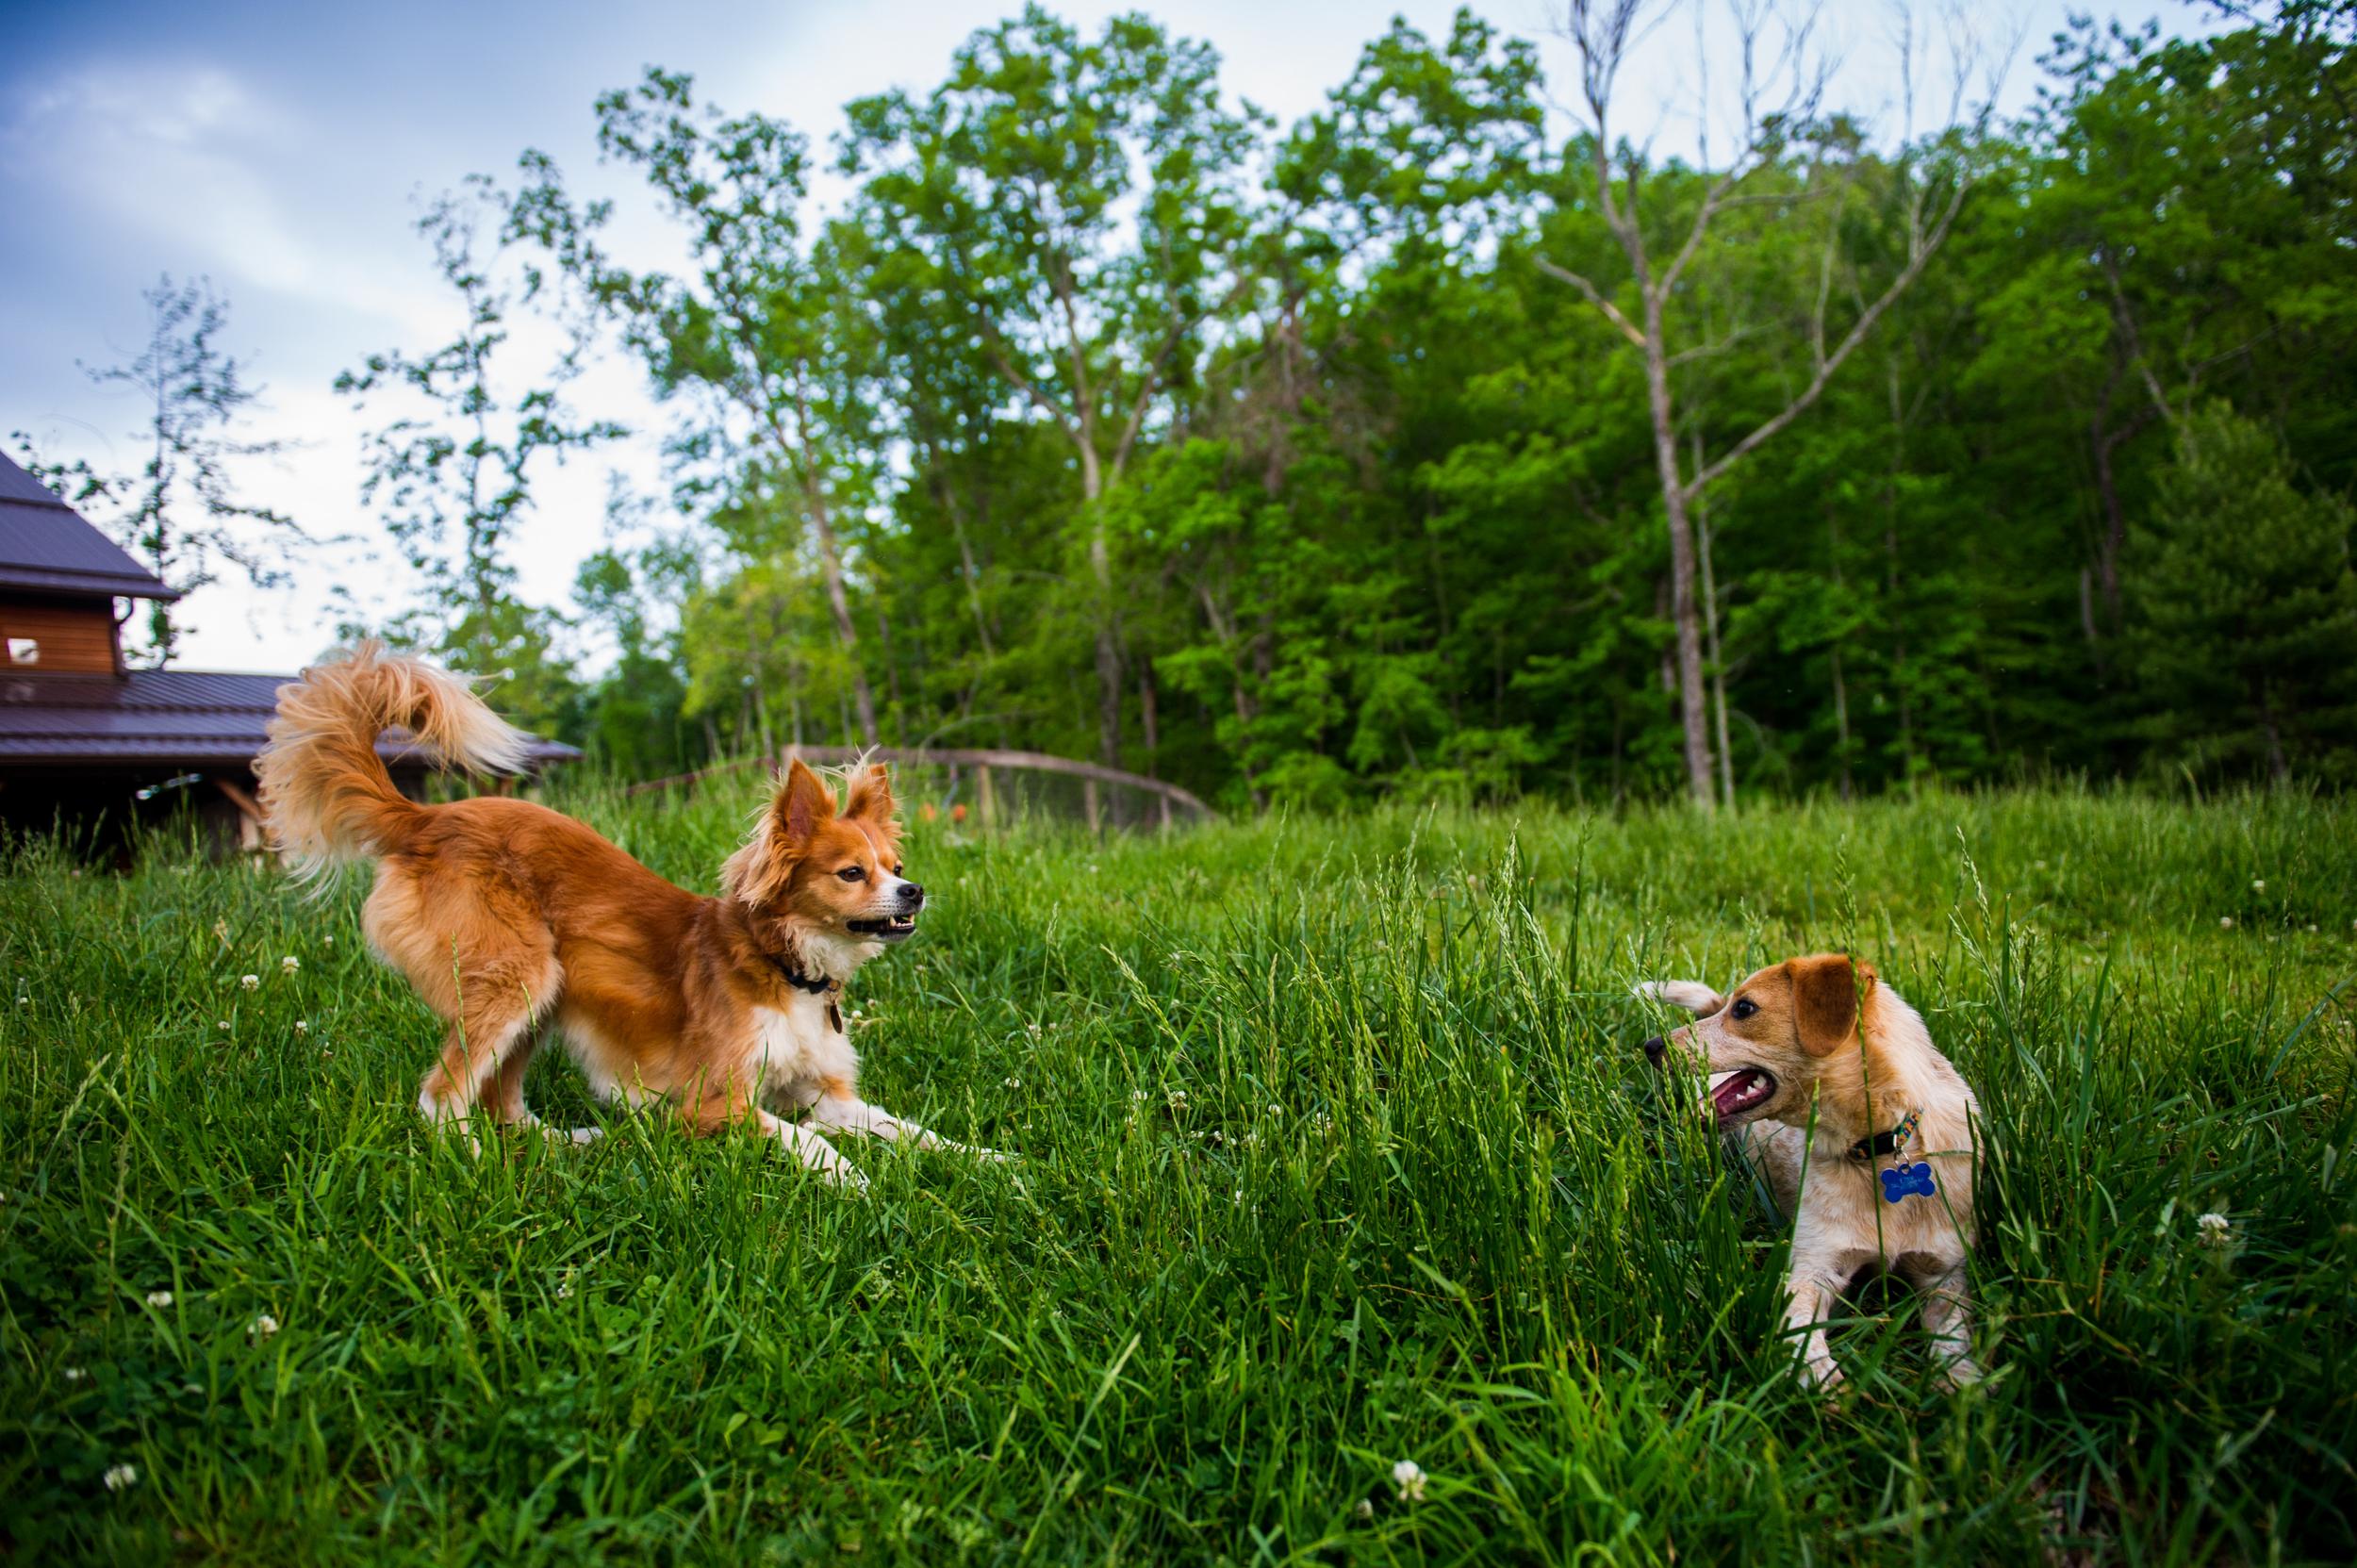 canine urinary incontinence dog